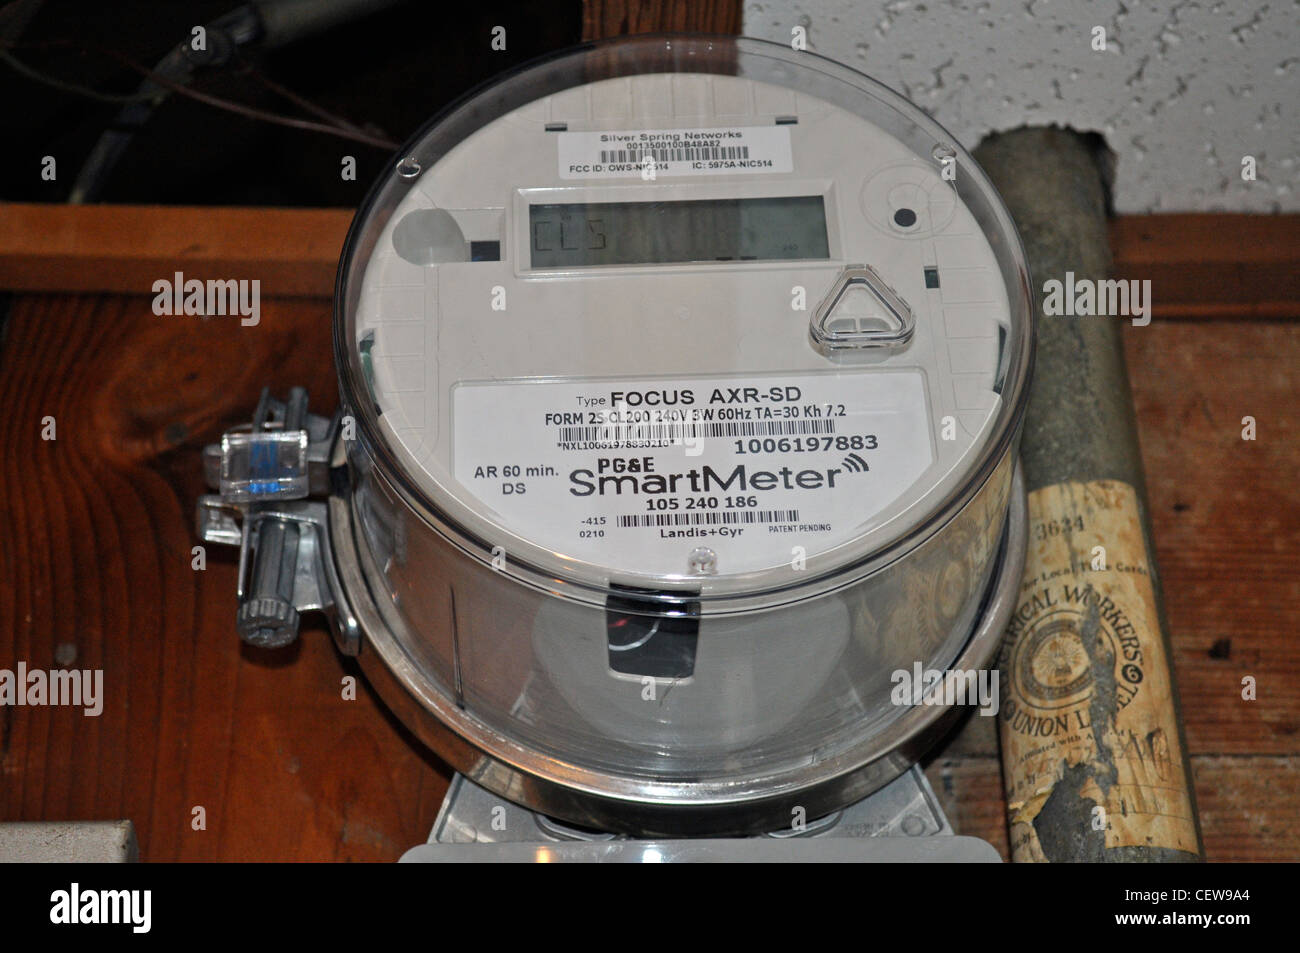 PG&E electric Smartmeter in home basement, San Francisco, California, USA - Stock Image